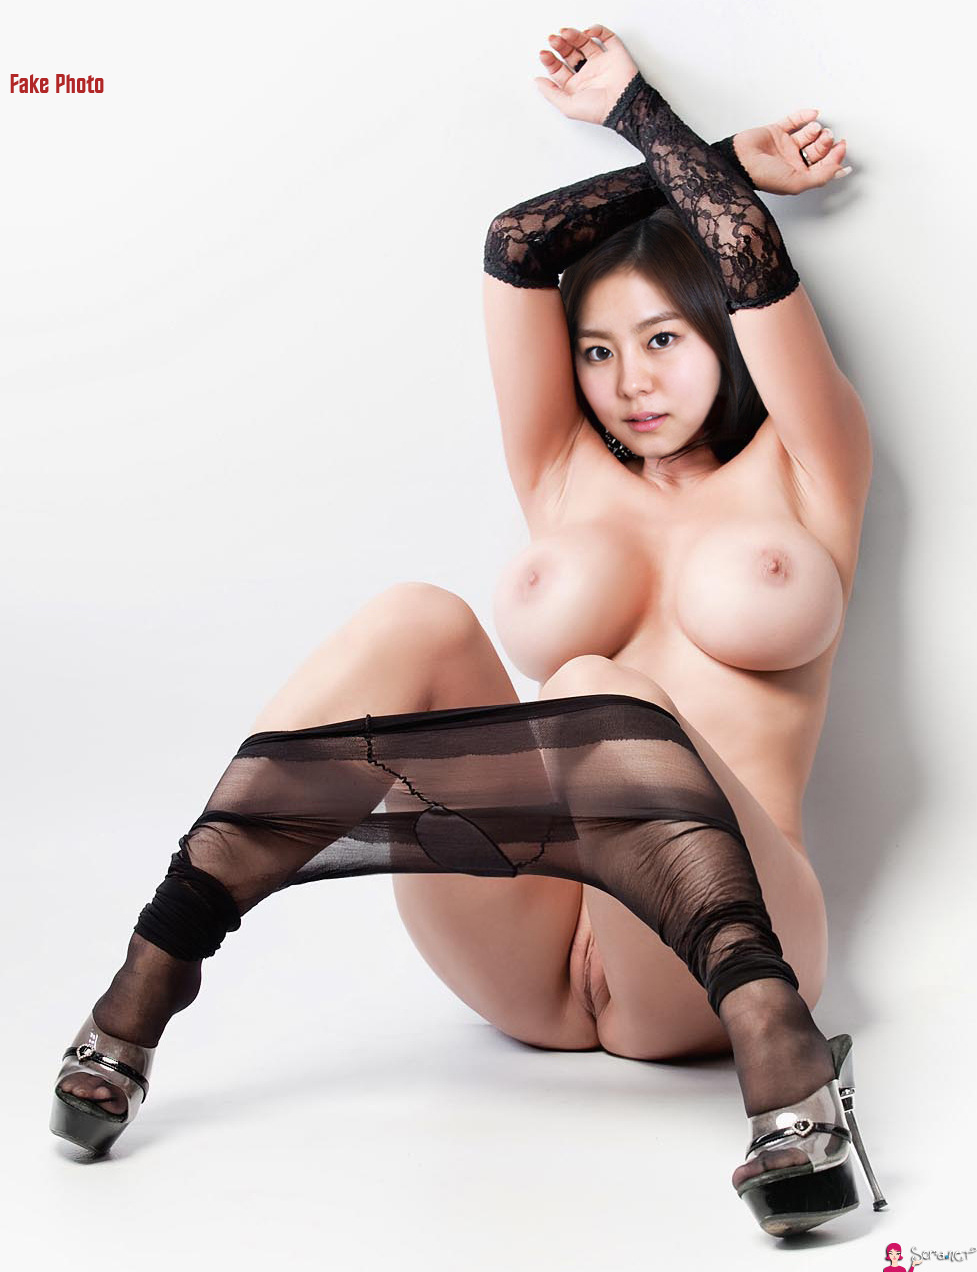 After School Kpop Fake Sex